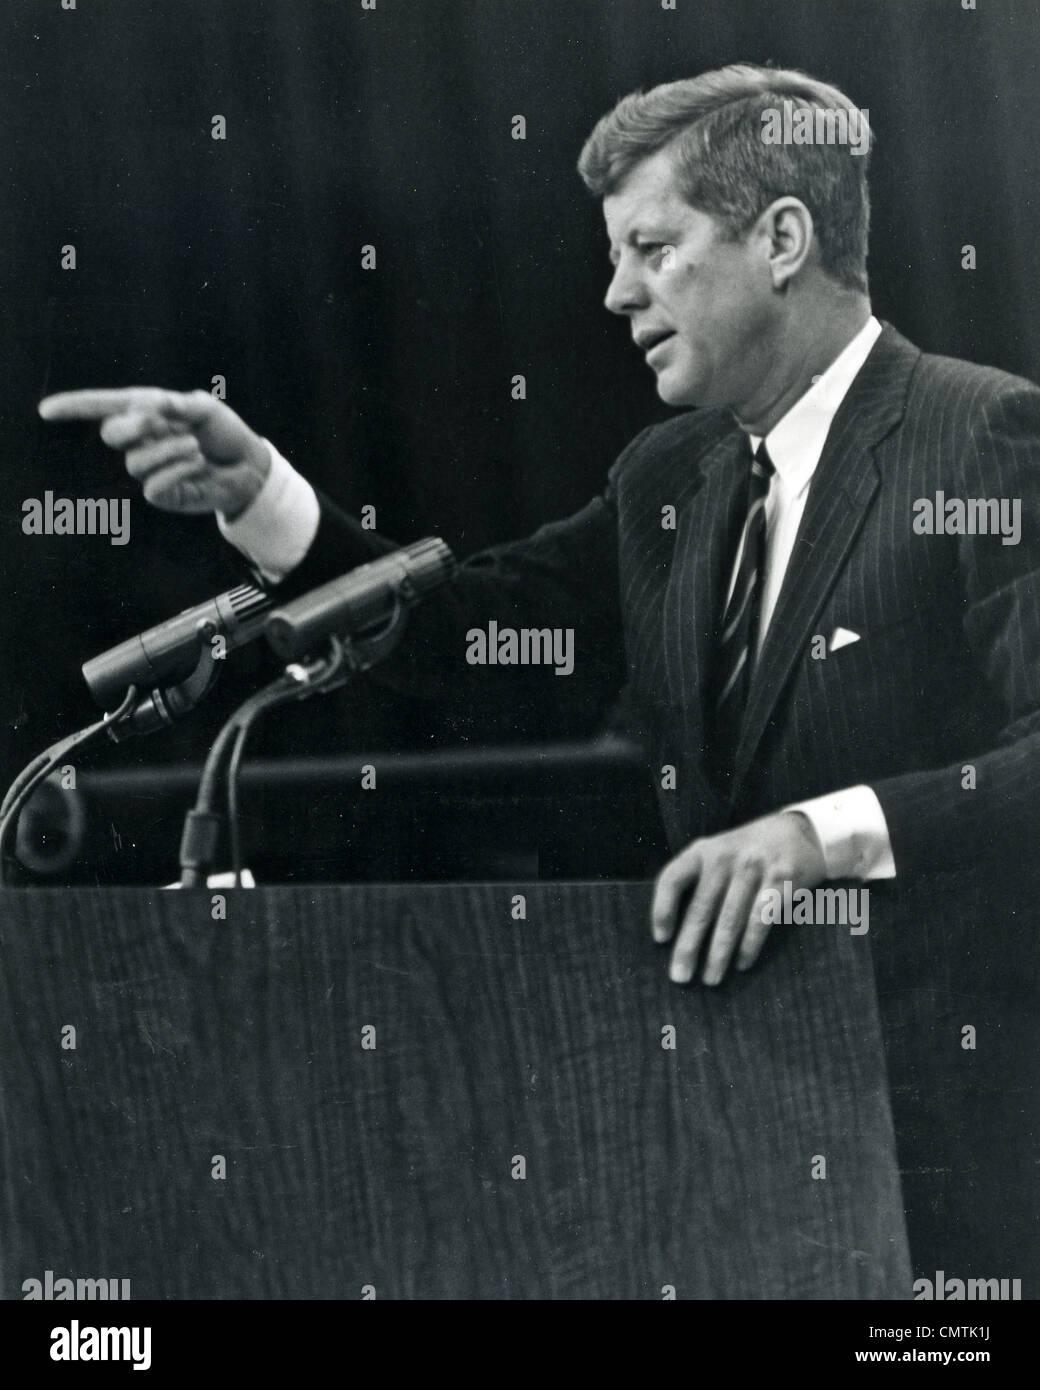 JOHN FITZGERALD KENNEDY  (1917-1963)  35th US President - Stock Image